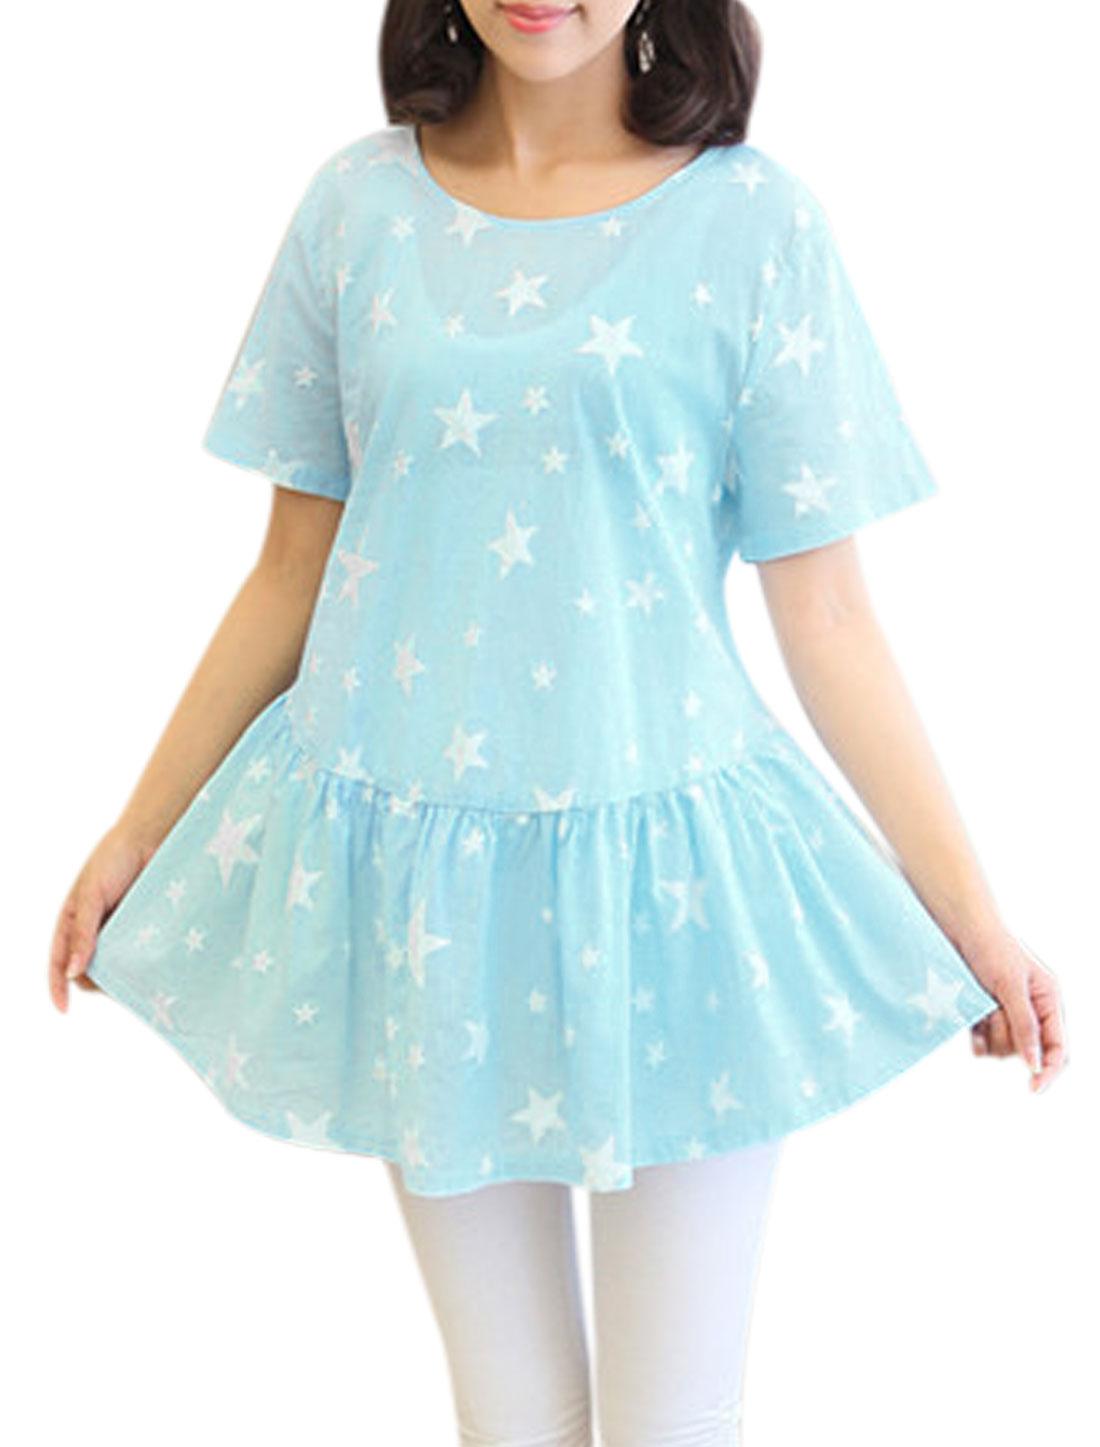 Maternity Stars Pattern One Button Back Semi Sheer Leisure Peplum Top Light Blue M